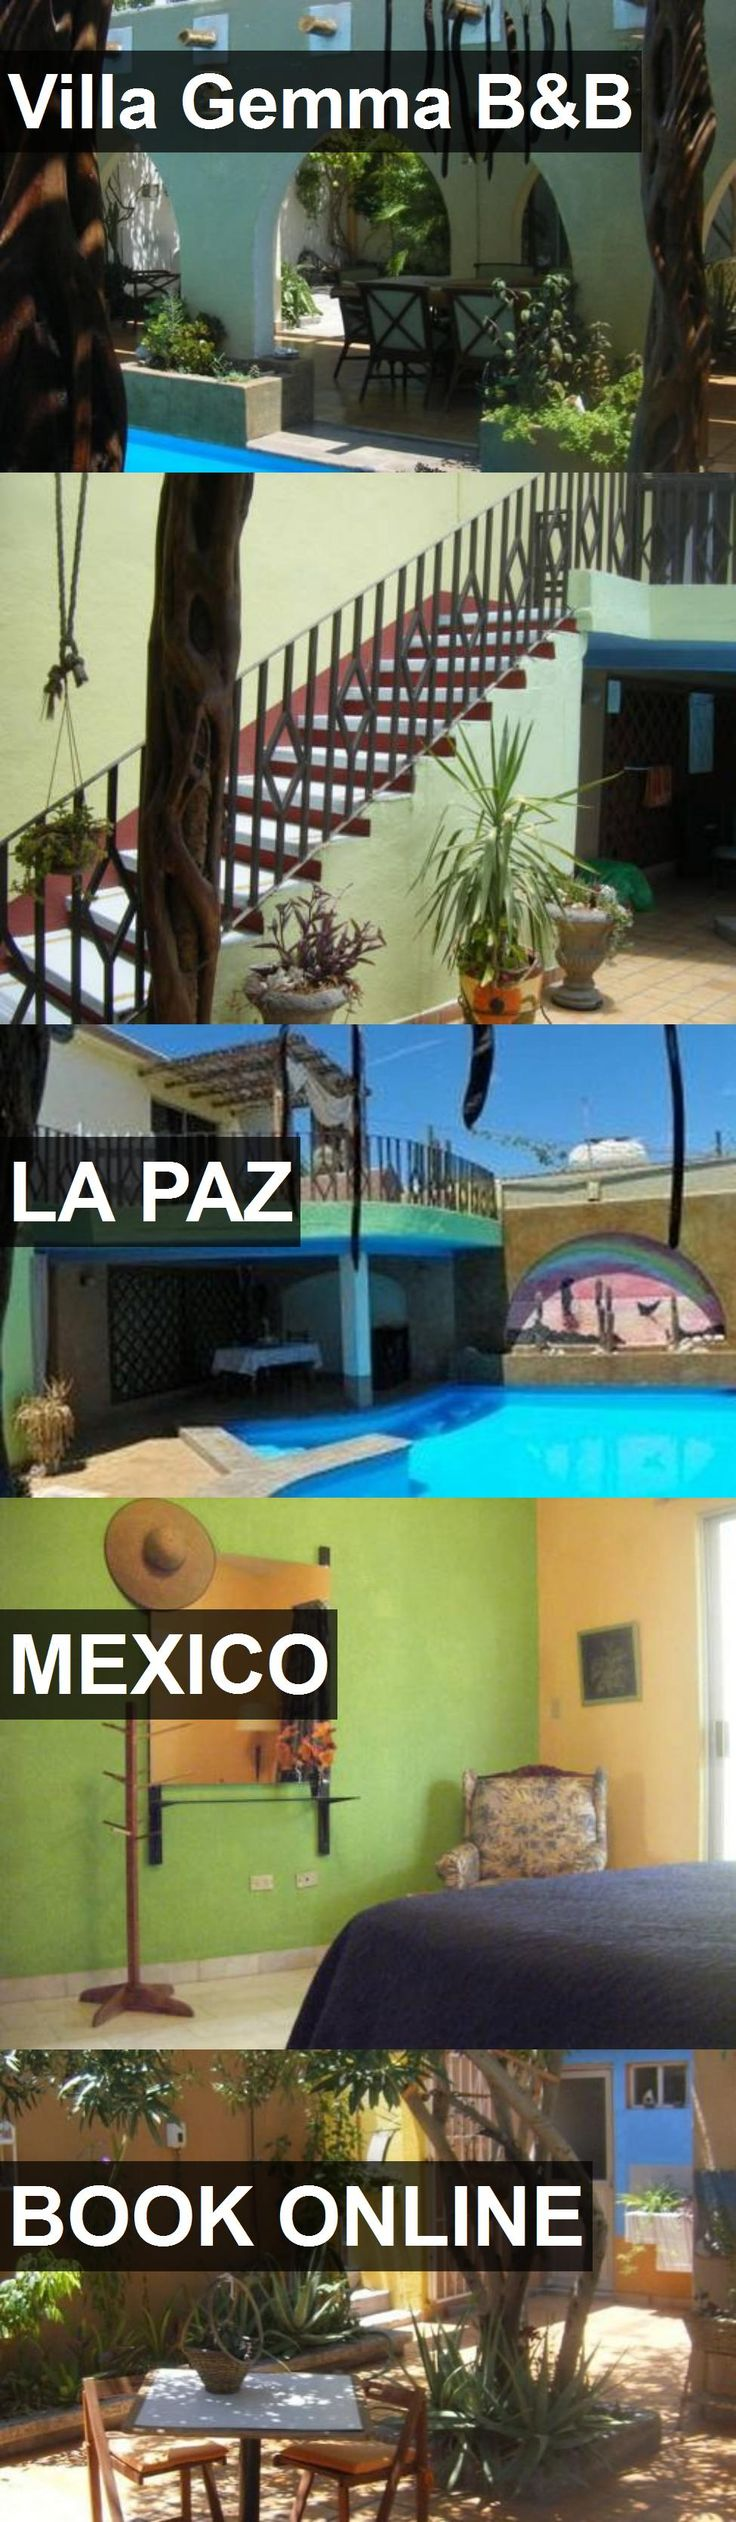 Hotel Villa Gemma B Villa, La paz, Mexico